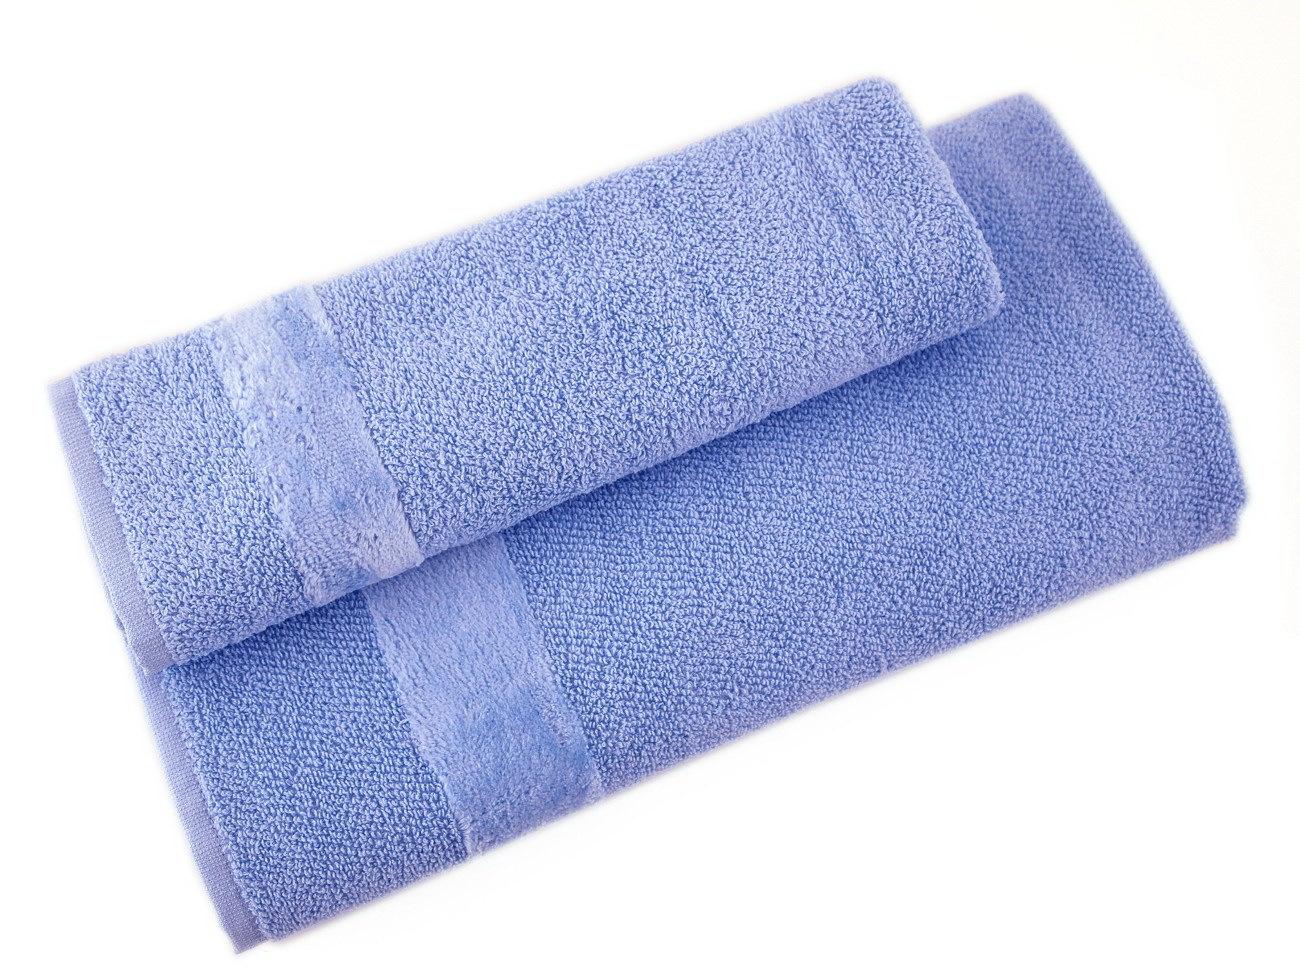 Ванная Полотенце 100х160 Carrara Fyber голубое elitnye-polotentsa-mahrovye-fyber-133-golubye-ot-carrara-italiya.JPG